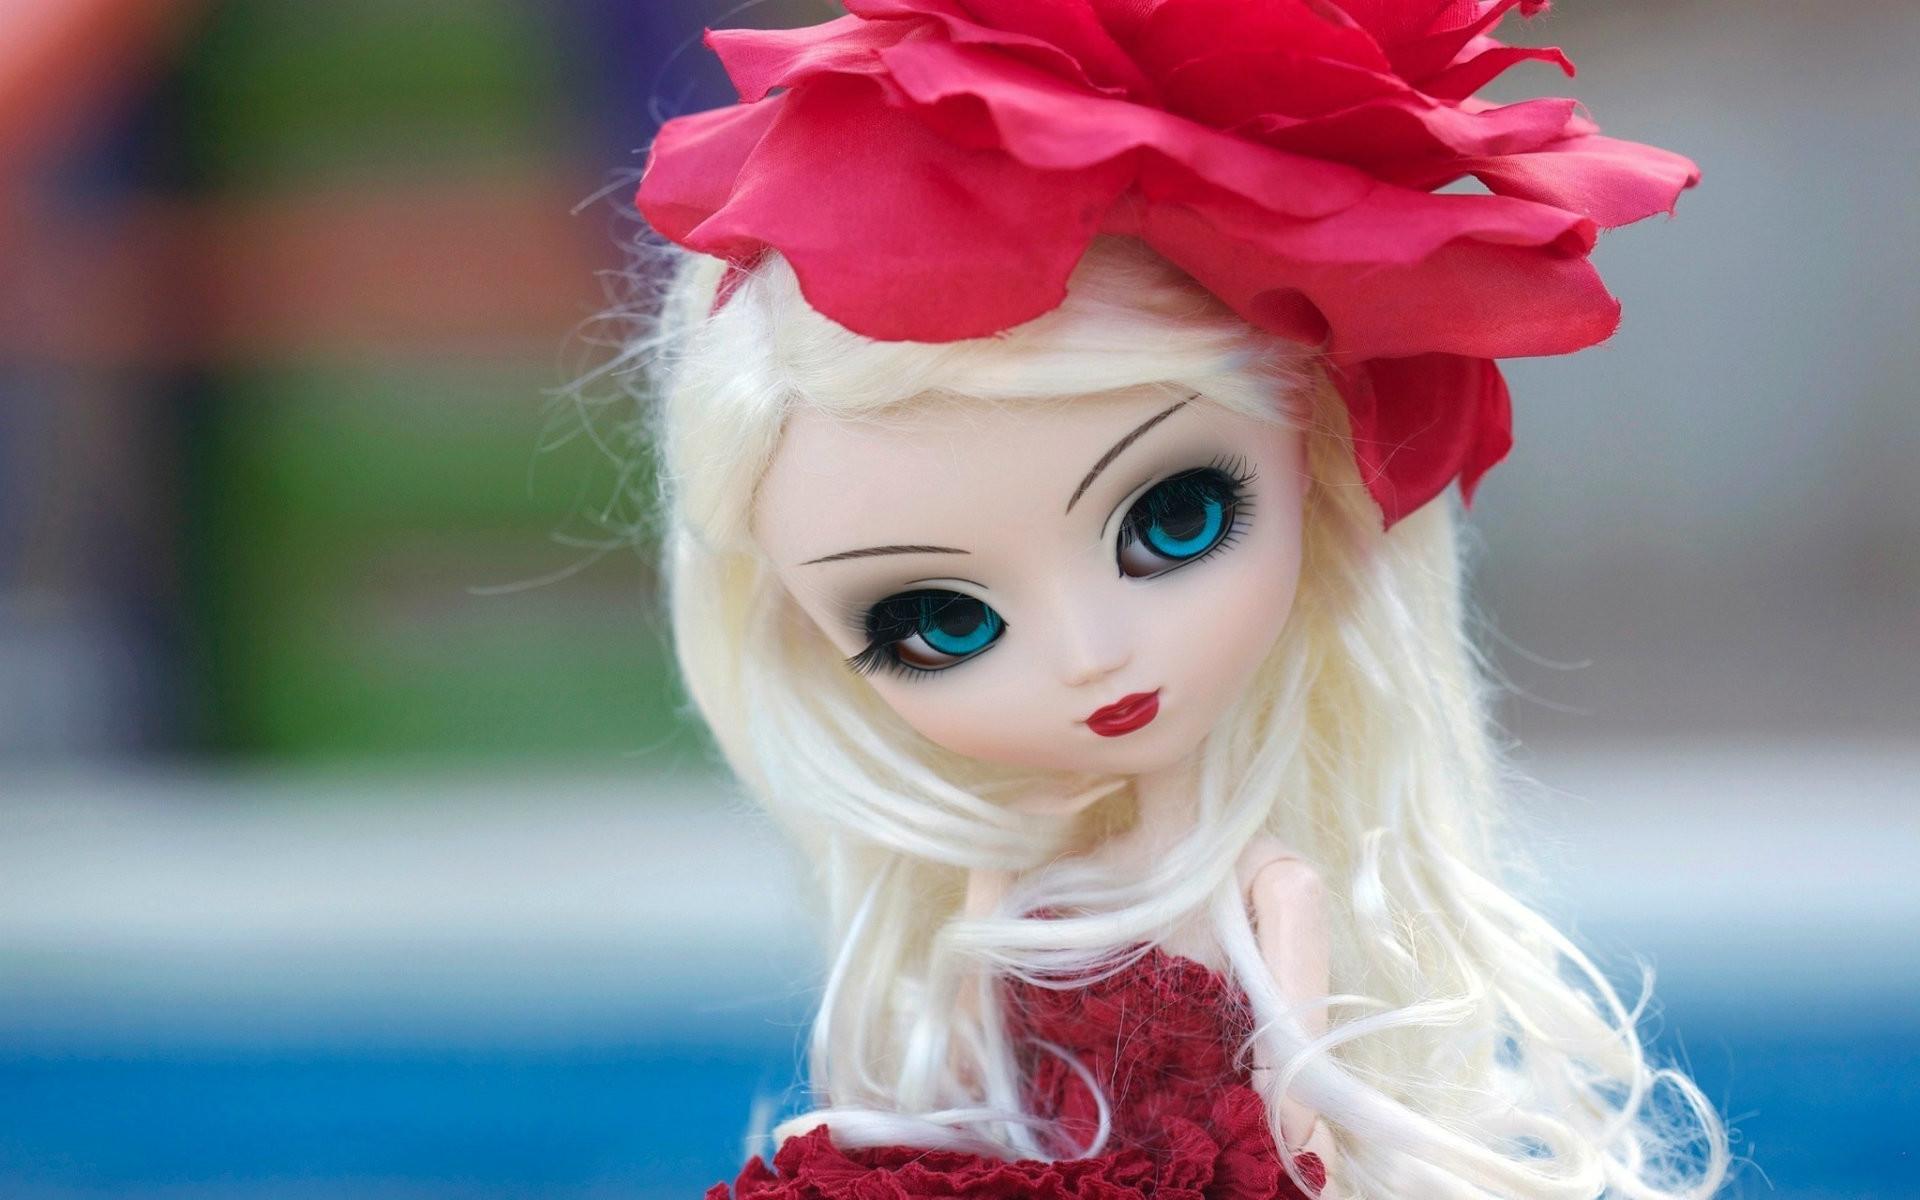 Most Beautiful Barbie Doll Wallpaper Cute Dolls Wallpaper – Top 25 High Quality Hd Wallpapers .